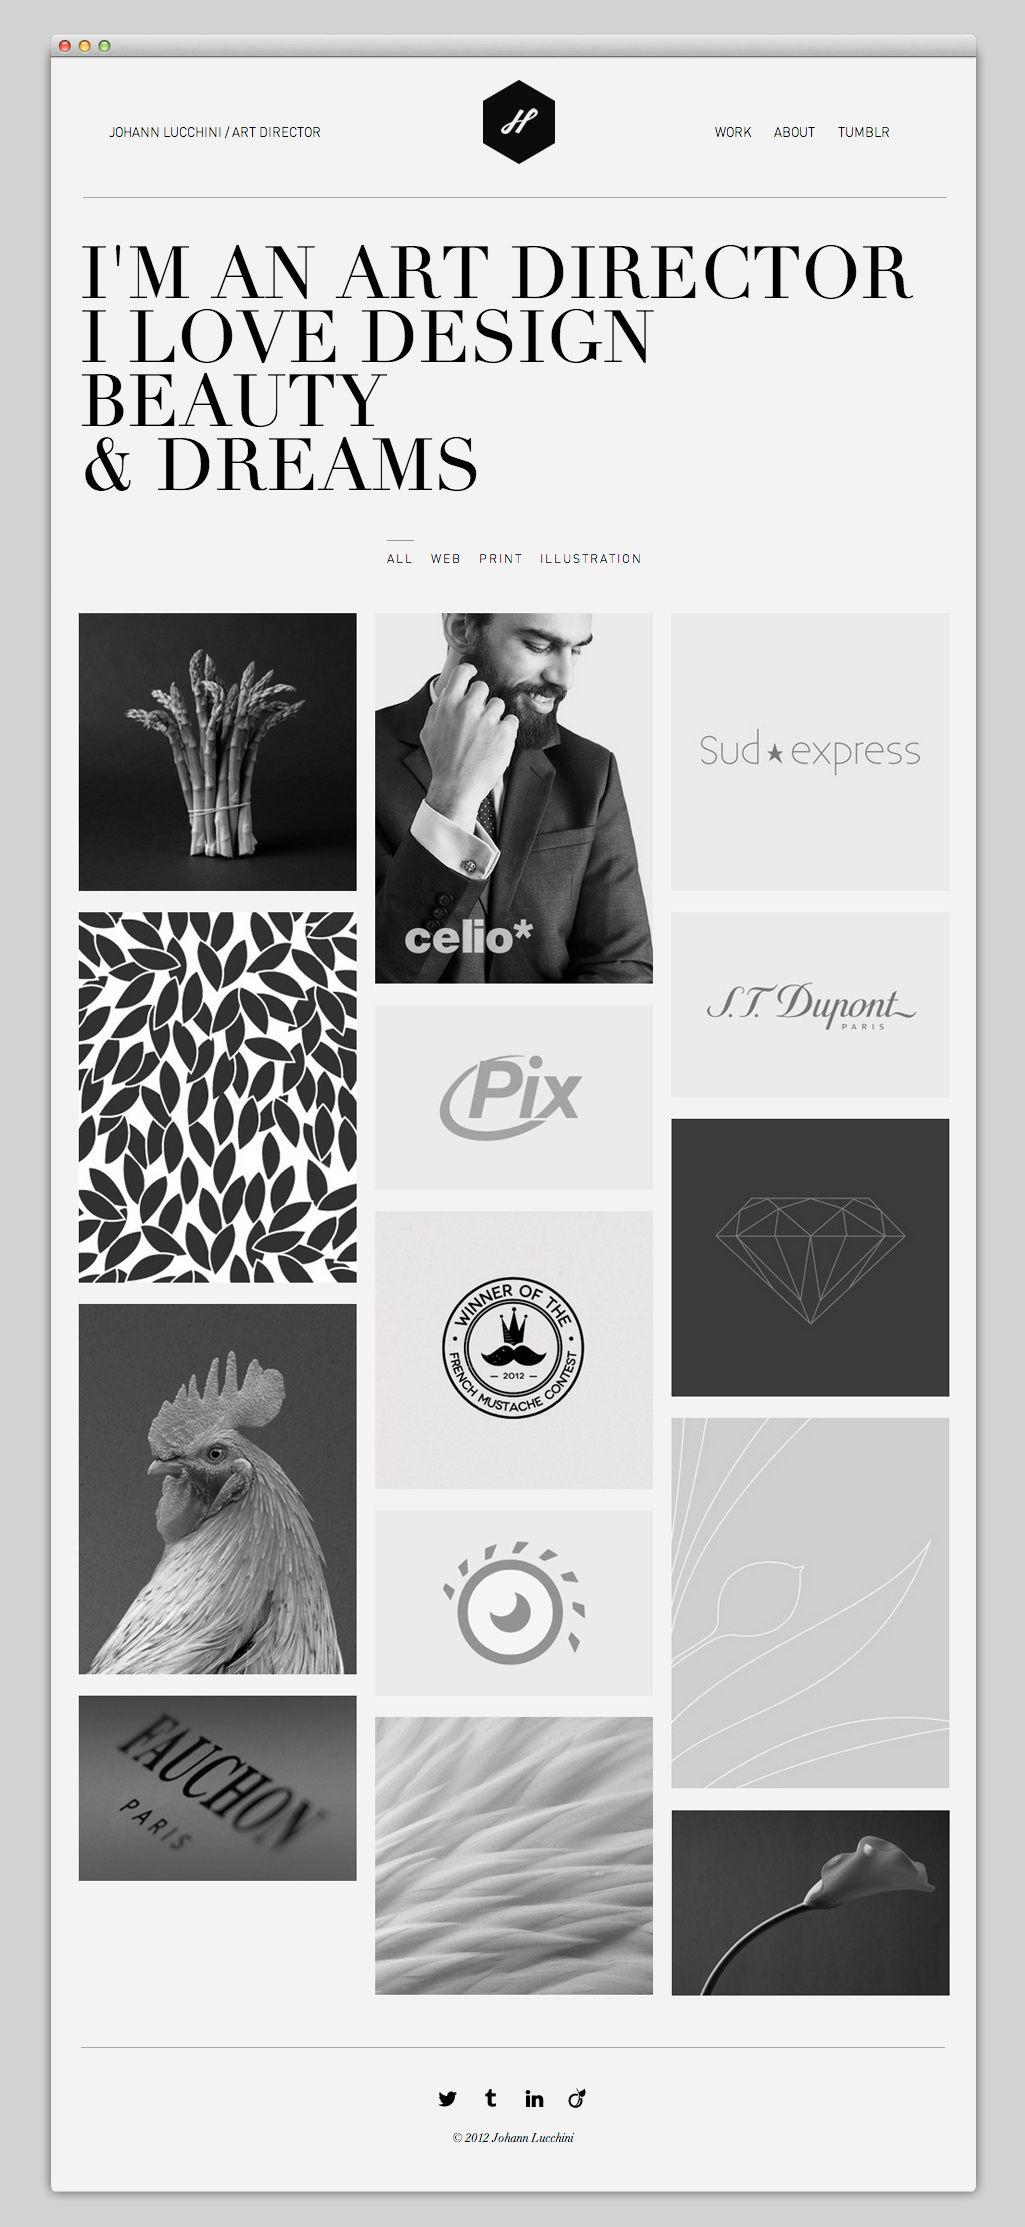 the web aesthetic johann lucchini ux ui web design pinterest design svart och. Black Bedroom Furniture Sets. Home Design Ideas